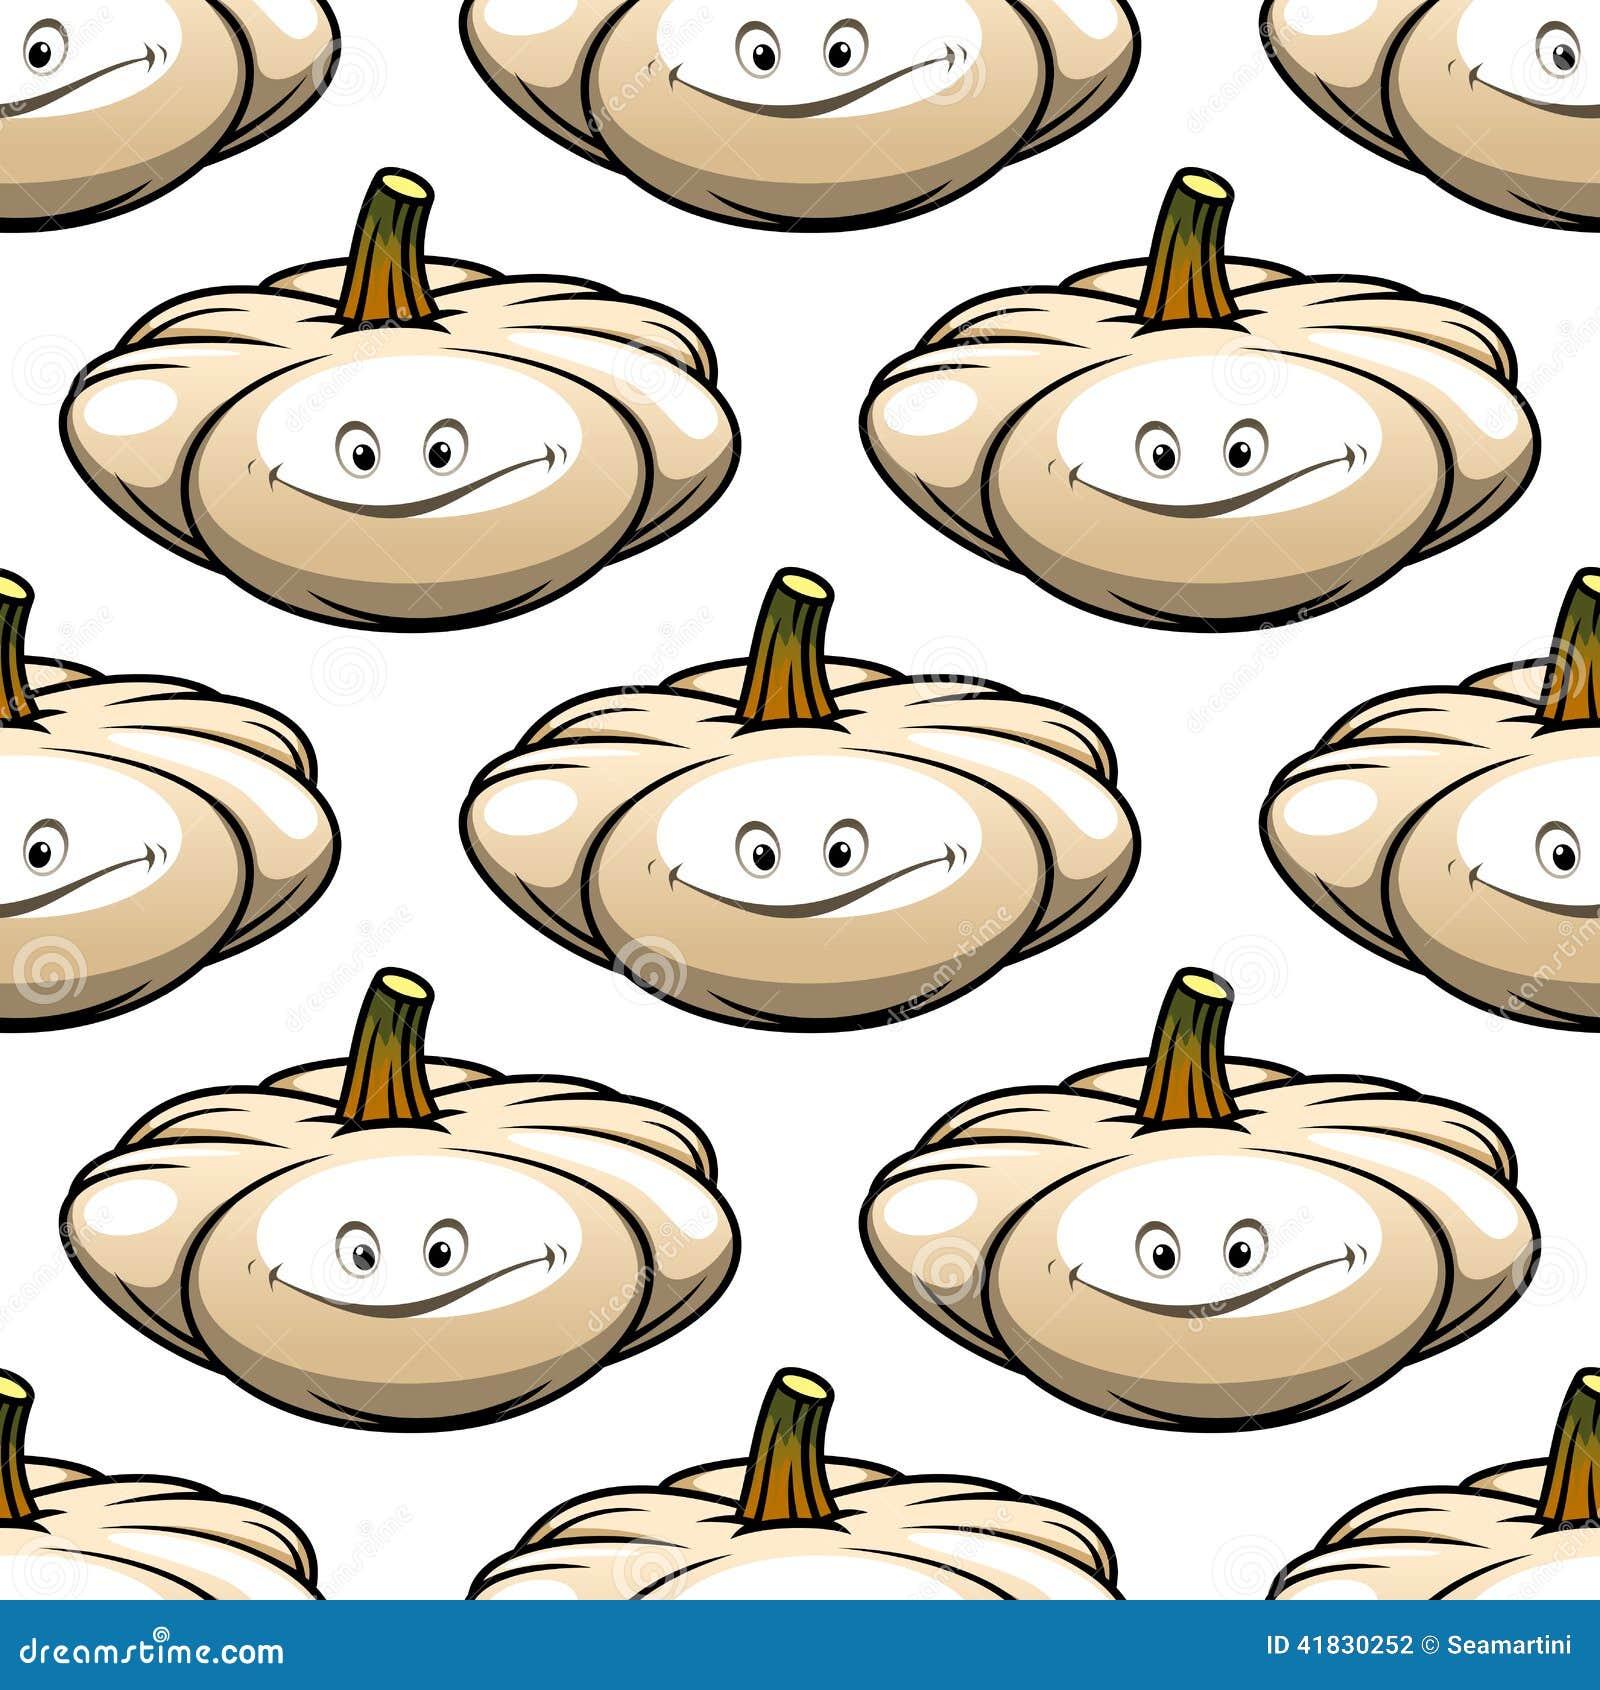 Funny cartoon pumpkin seamless pattern stock vector for Cartoon pumpkin patterns